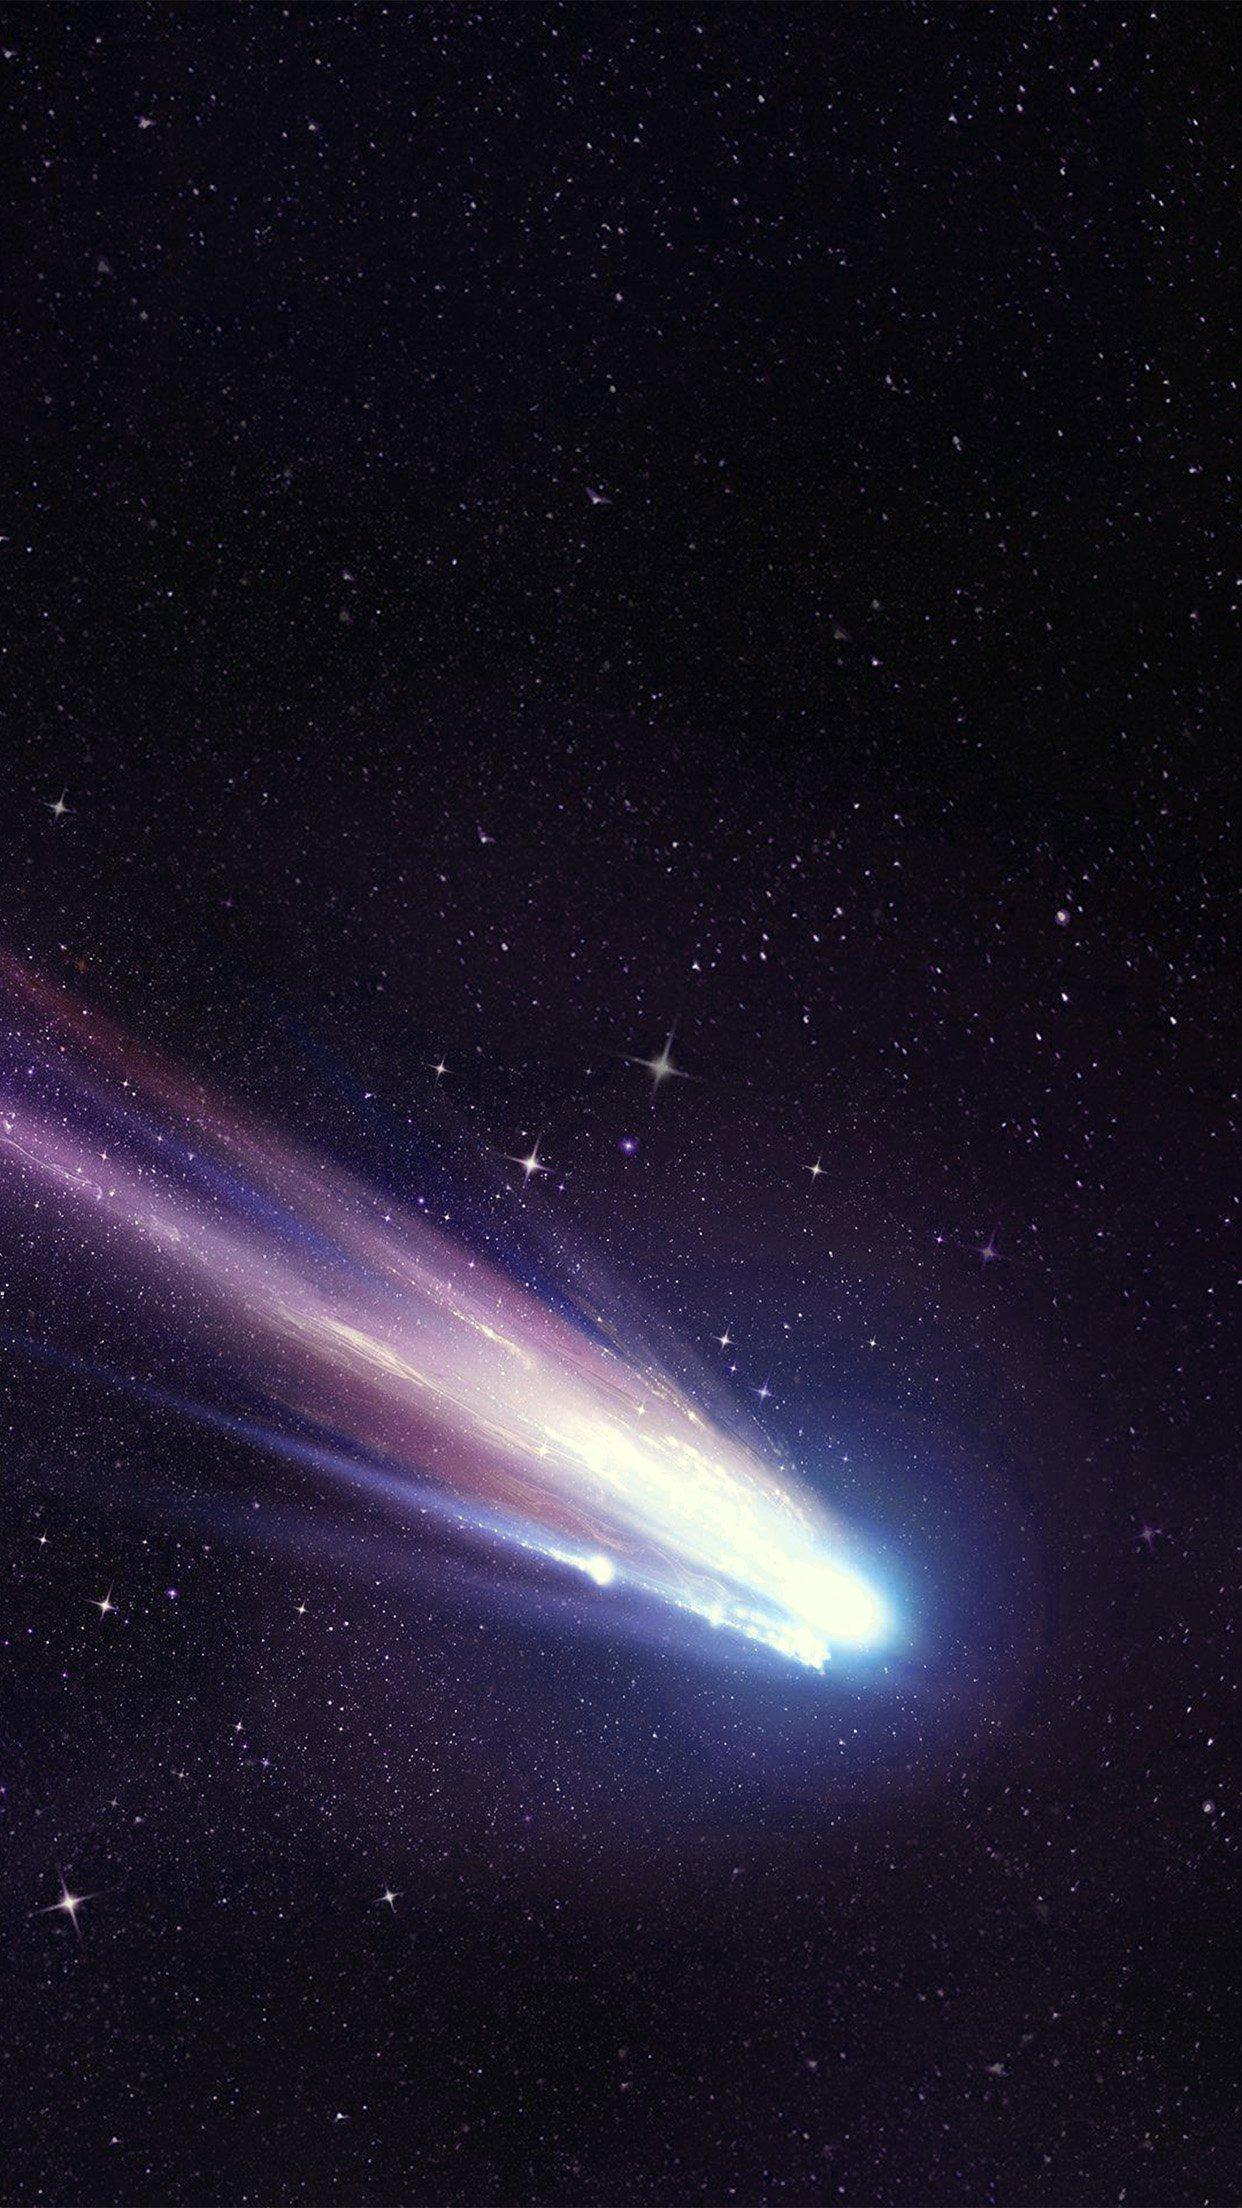 shootingstar space dark star purple blue art illustration android